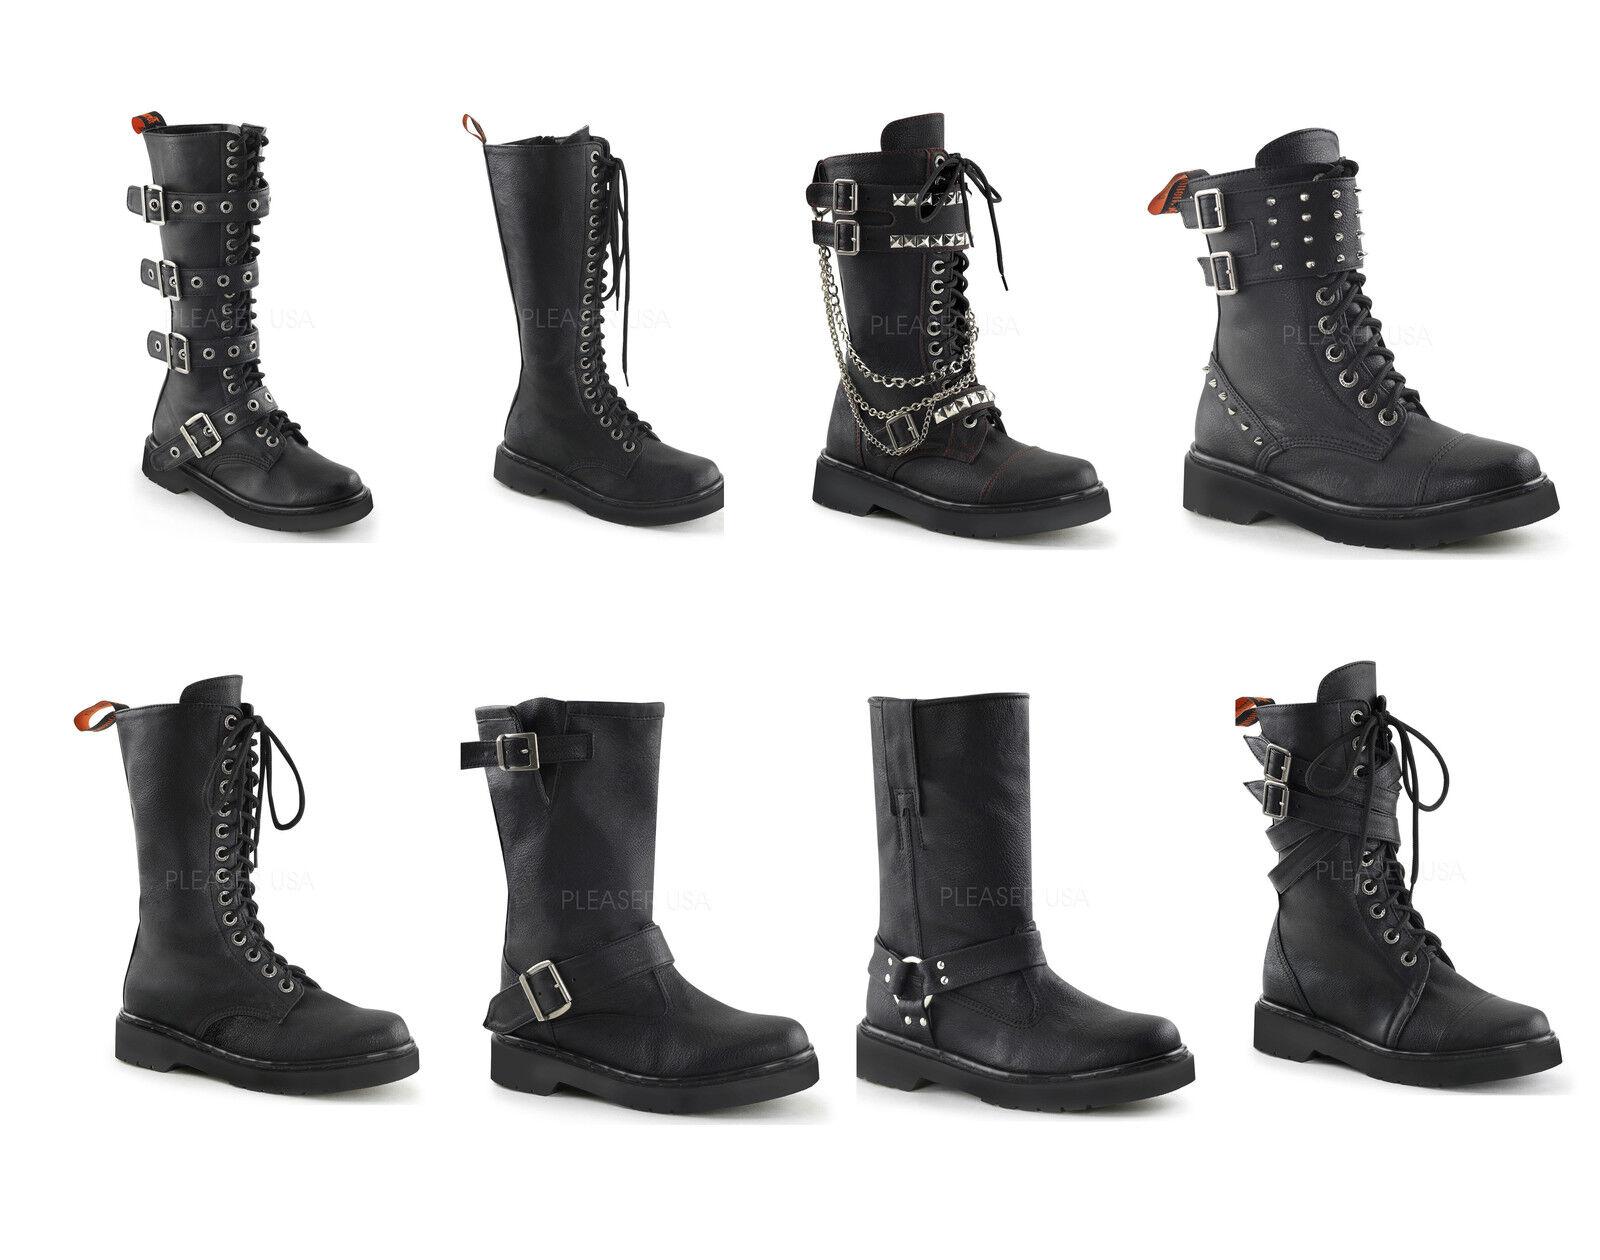 Demonia Women's RIVAL-300 302 303 307 309 315 400 404 Combat Motorcycle Boots